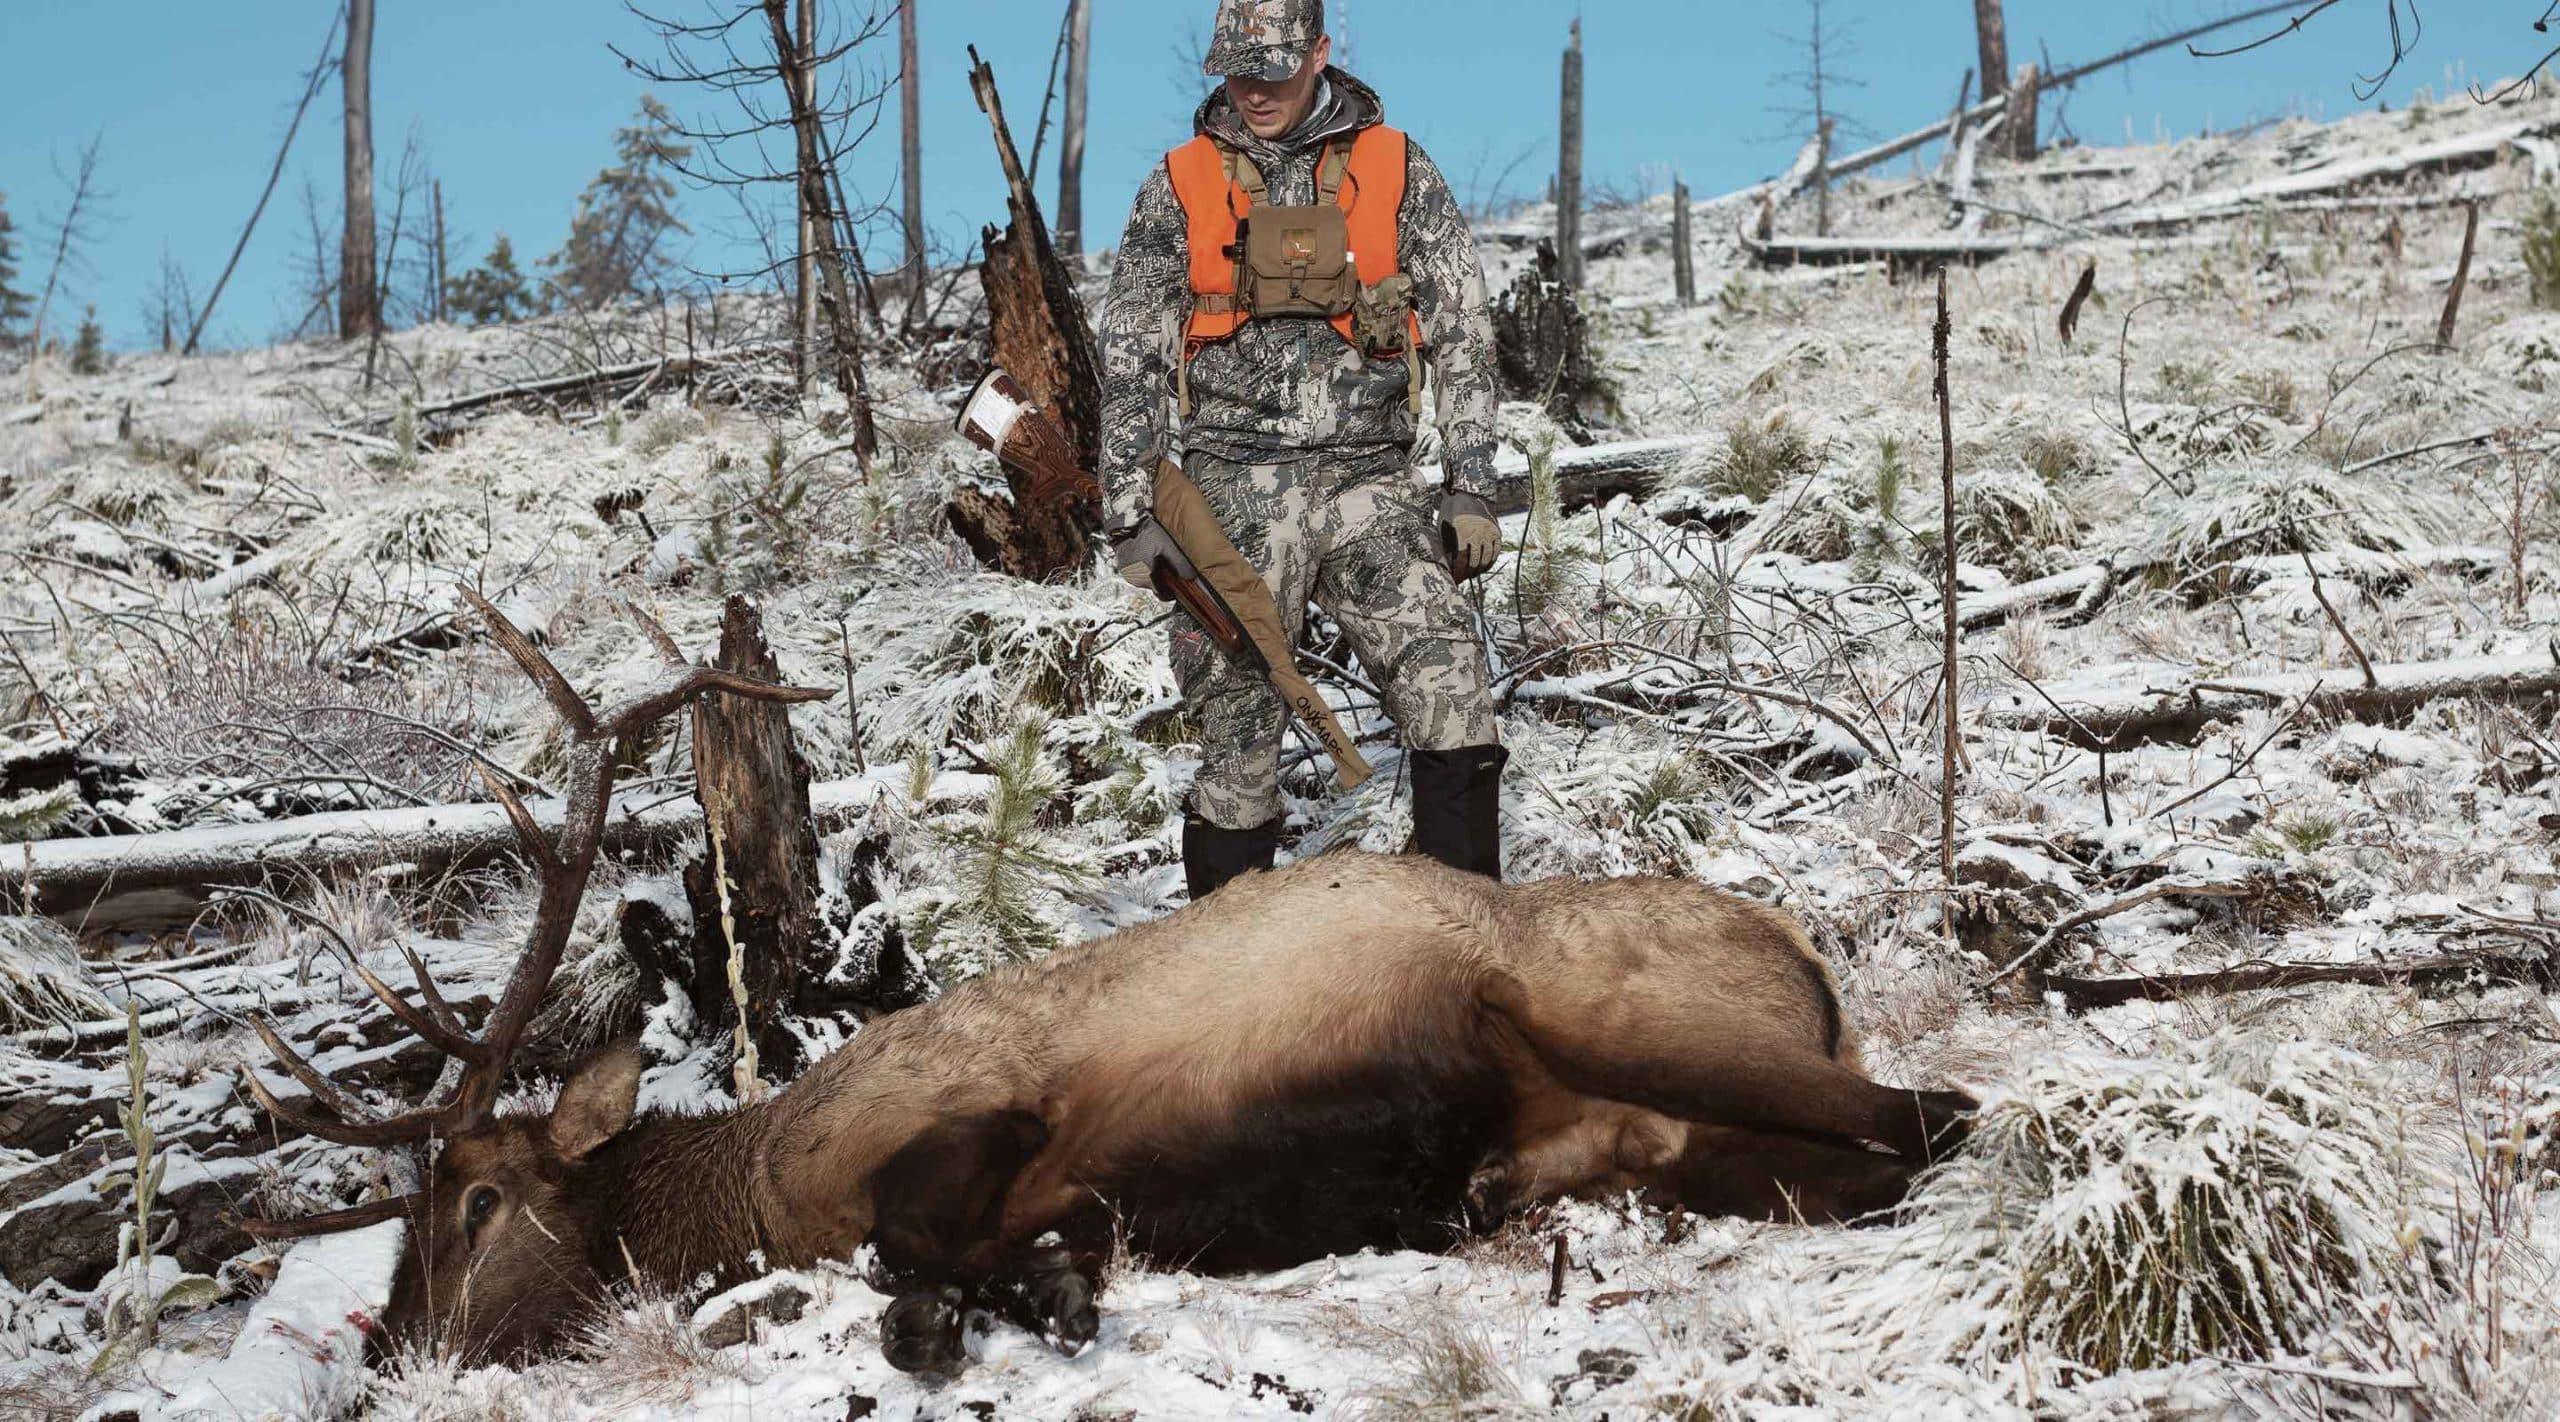 A late-season bull elk shot in the snow in Montana.